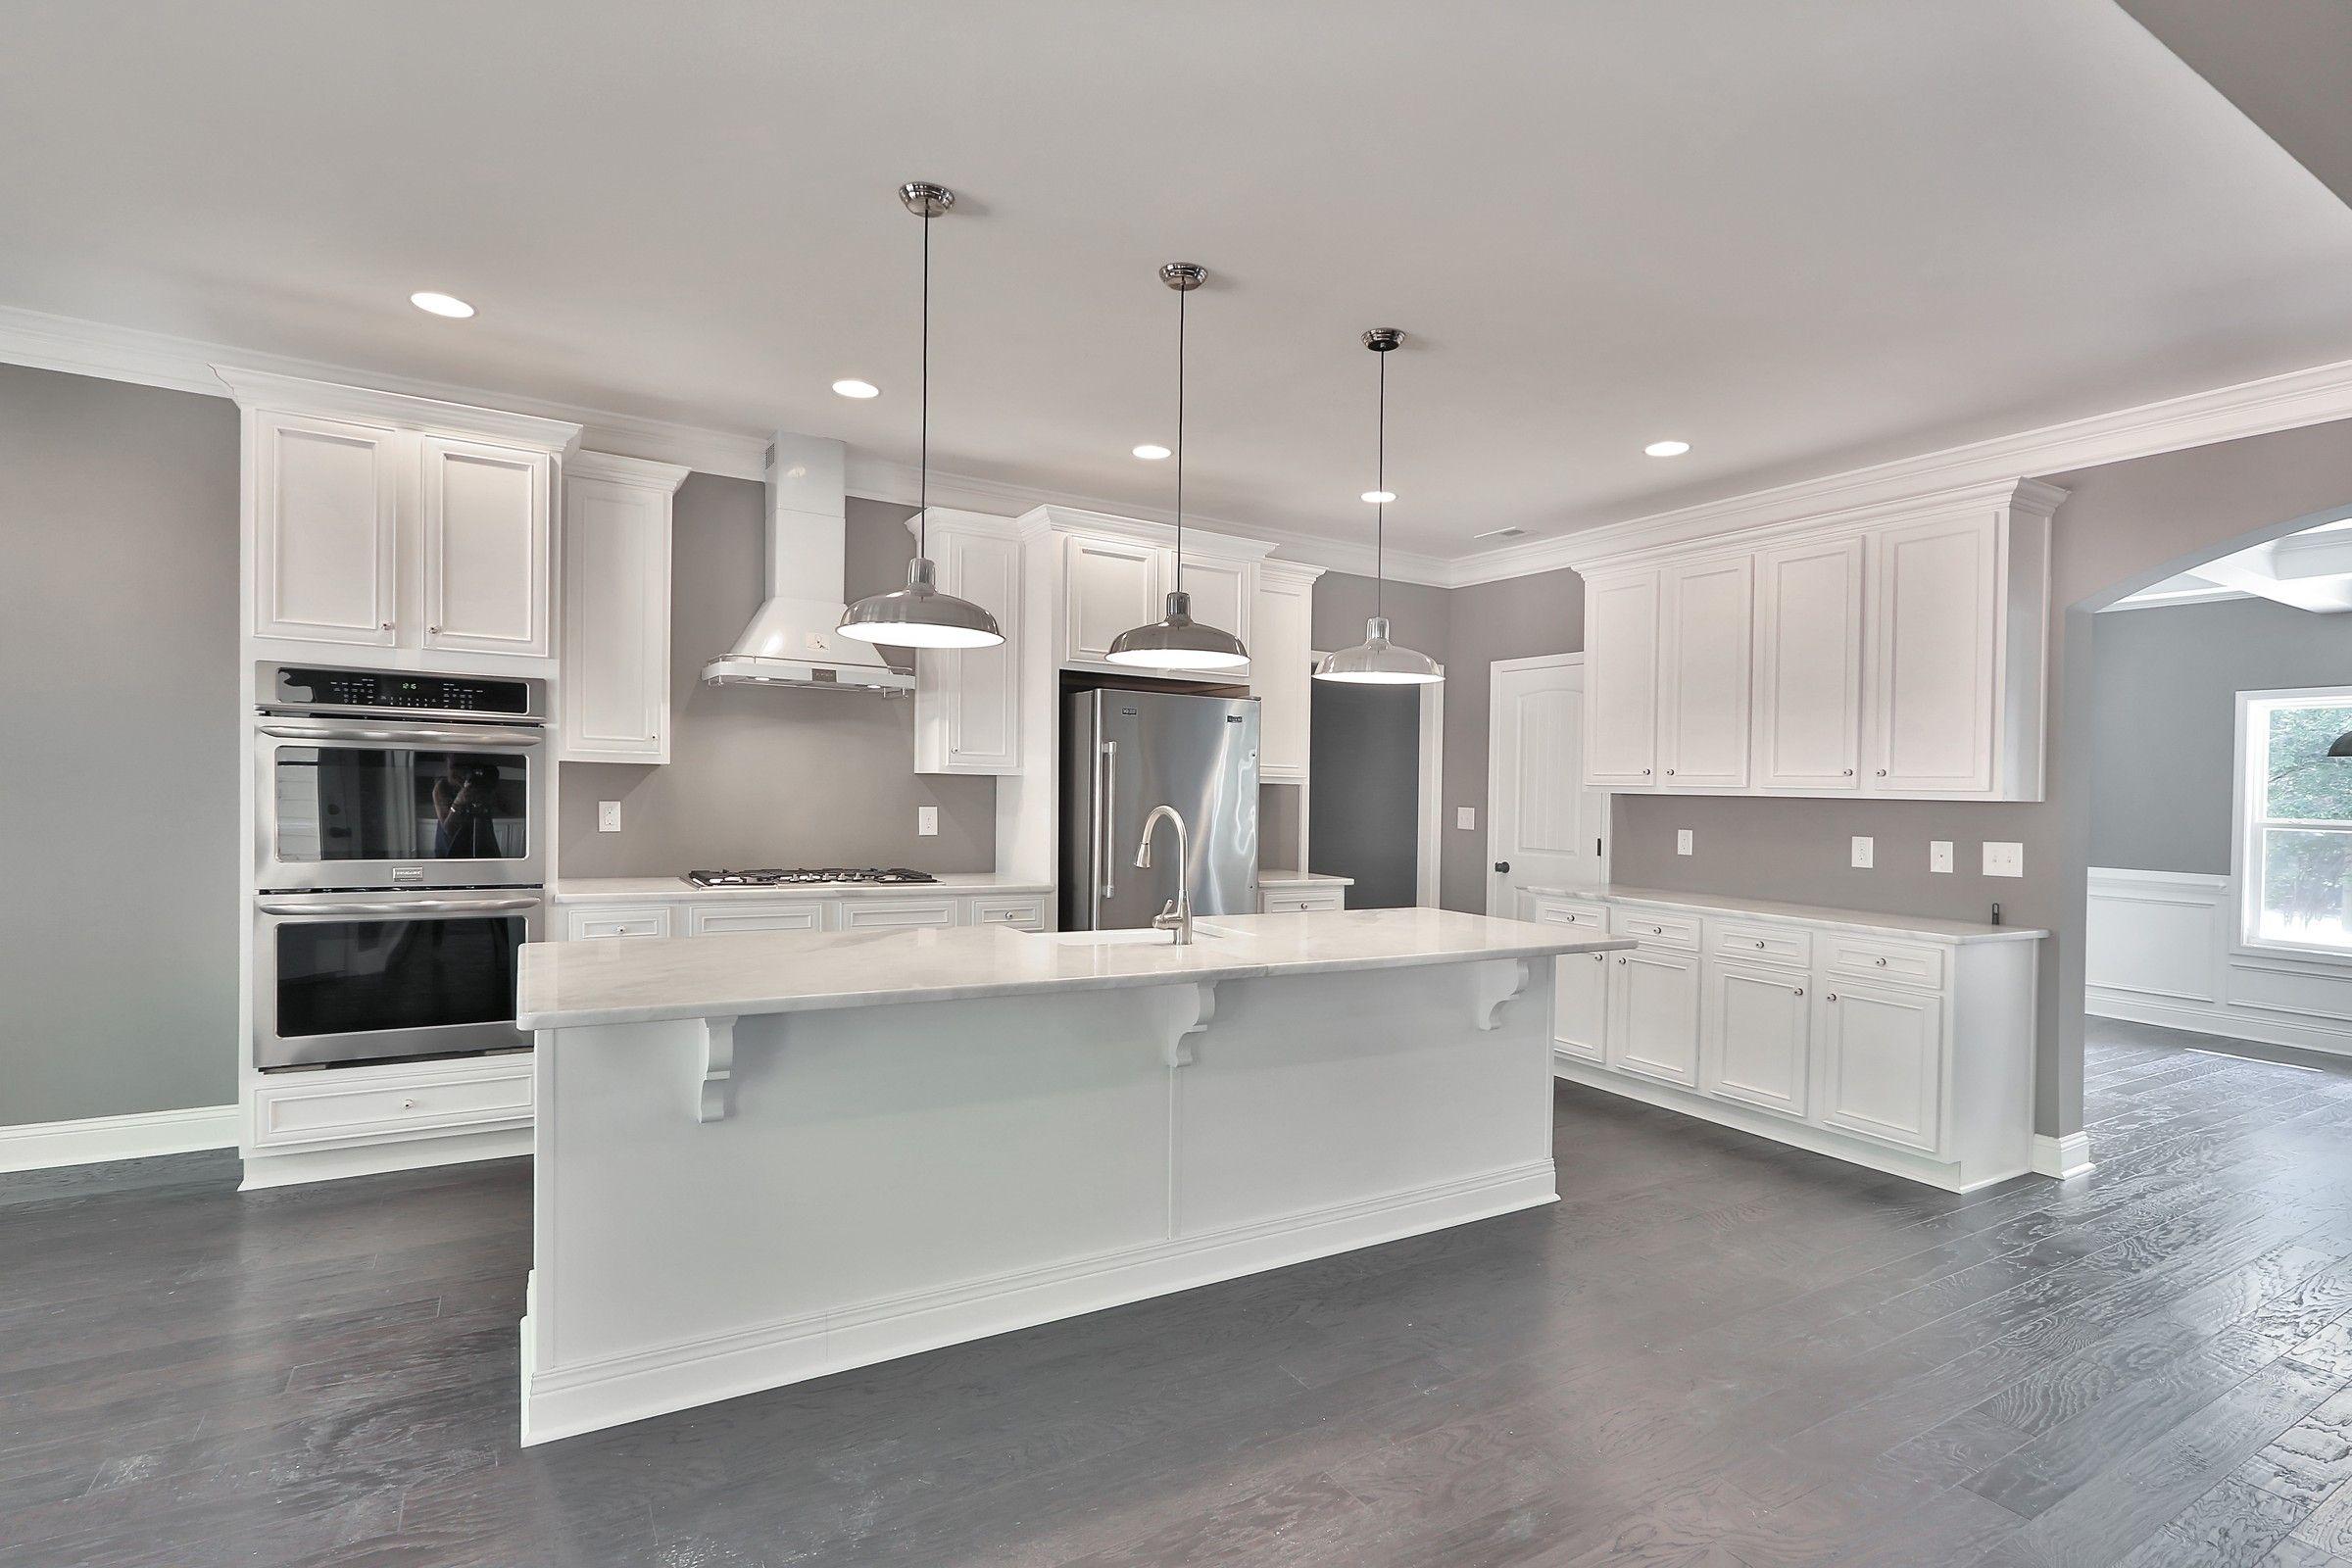 Plan 36061dk Bright And Airy Craftsman House Plan White Kitchen